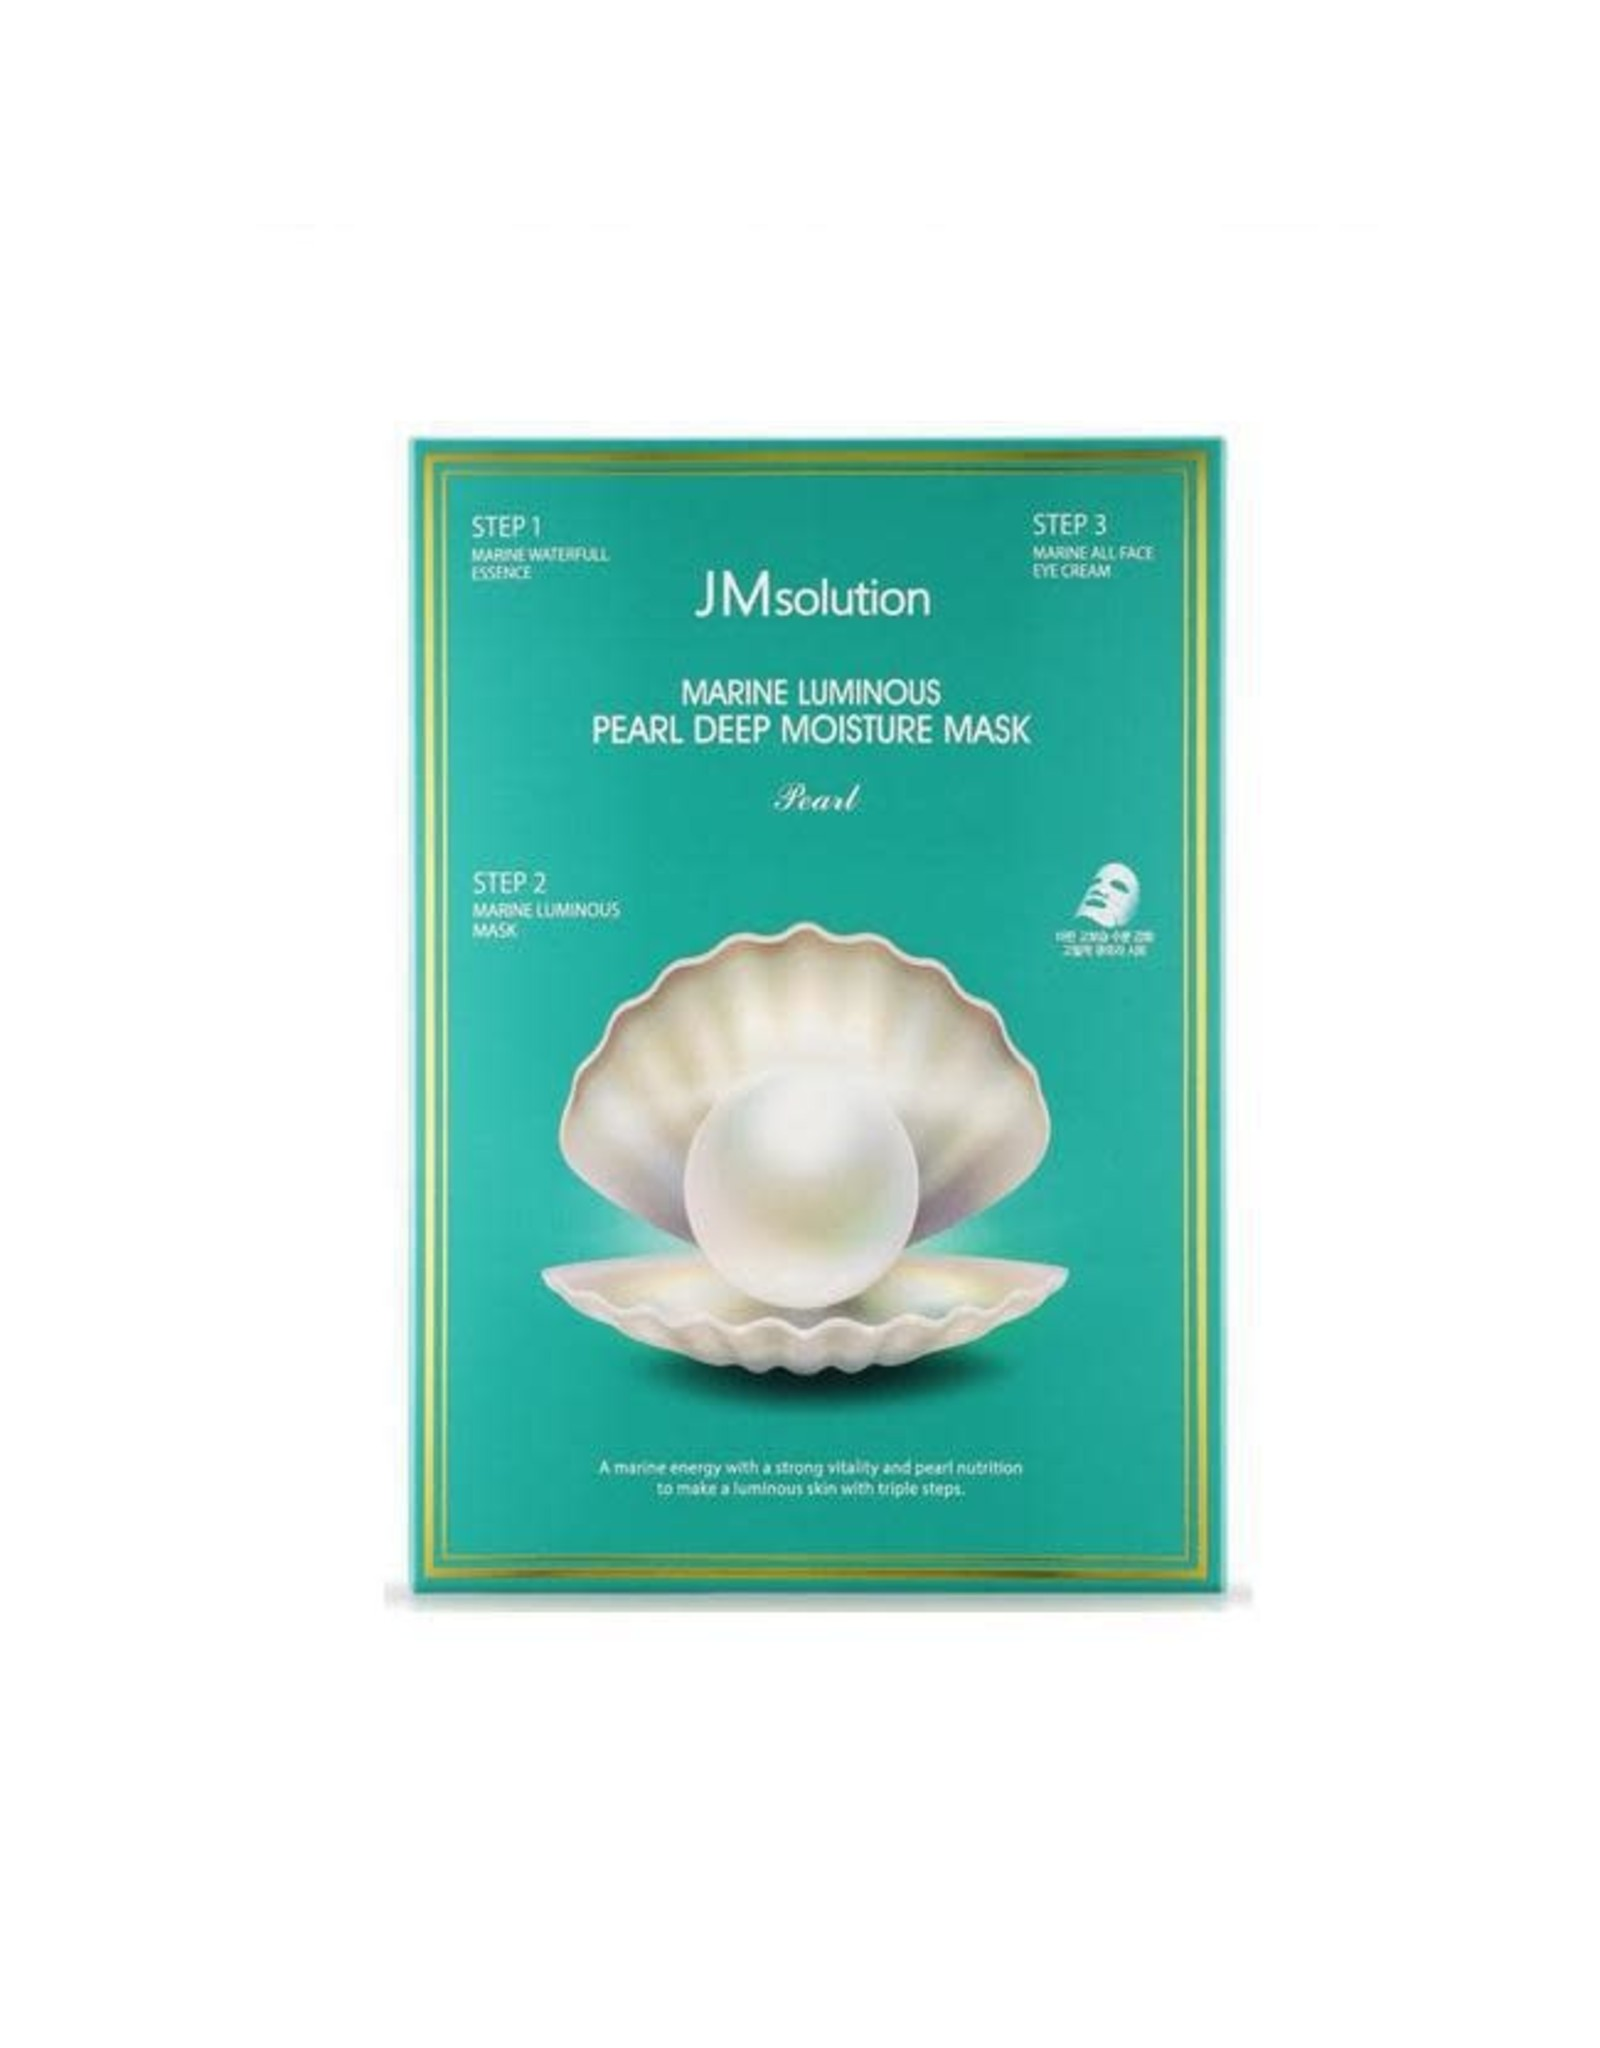 JM Solution JM Solution Marine Luminous Pearl Deep Moisture Mask